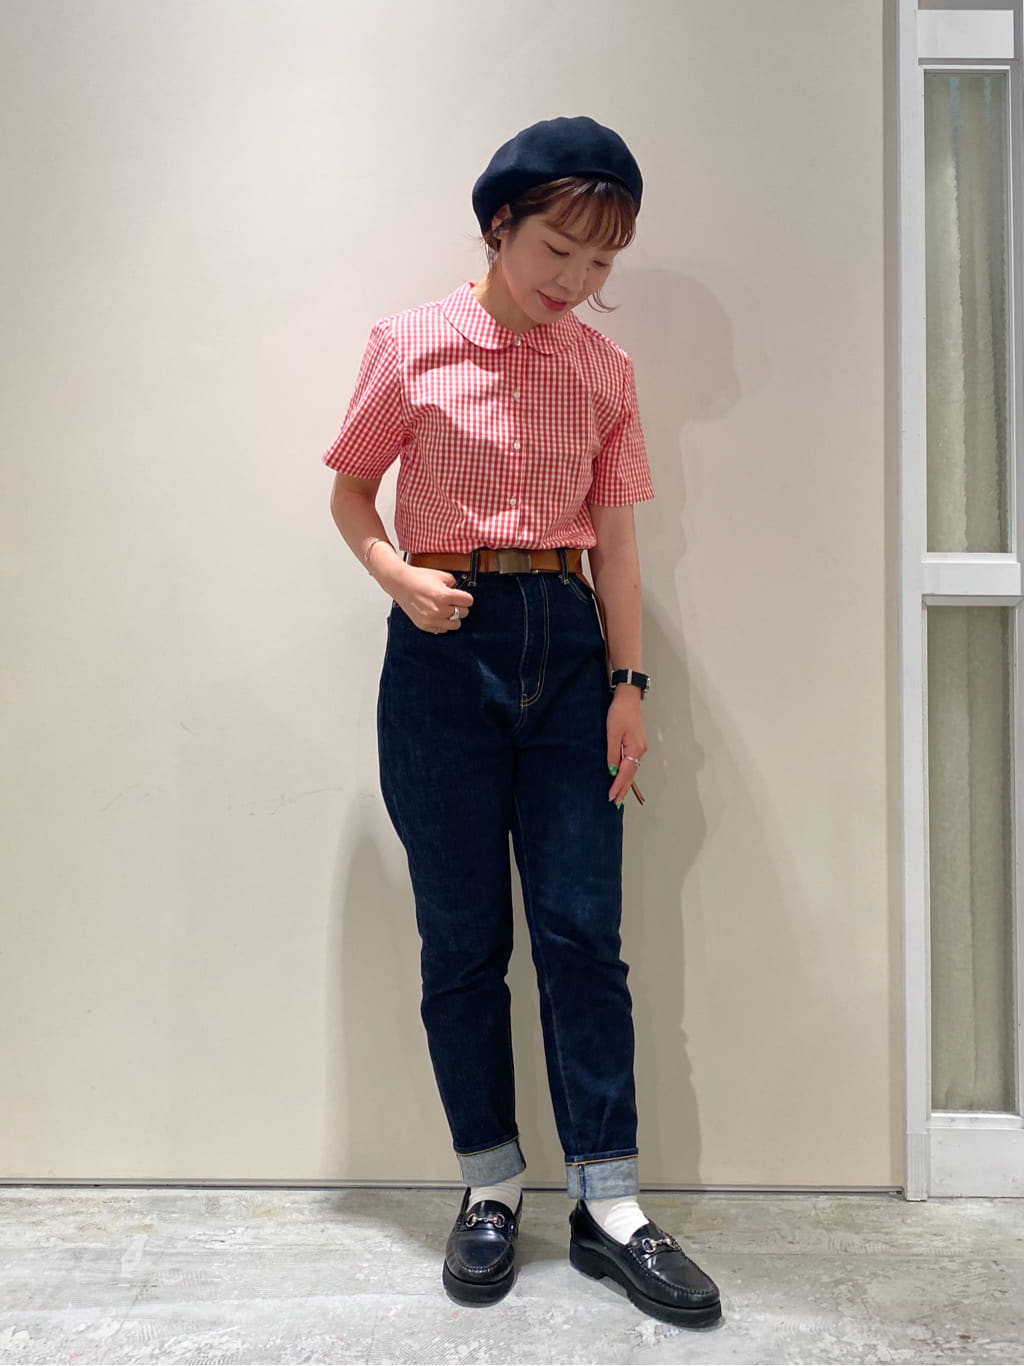 - CHILD WOMAN CHILD WOMAN , PAR ICI ルミネ横浜 身長:153cm 2021.08.13